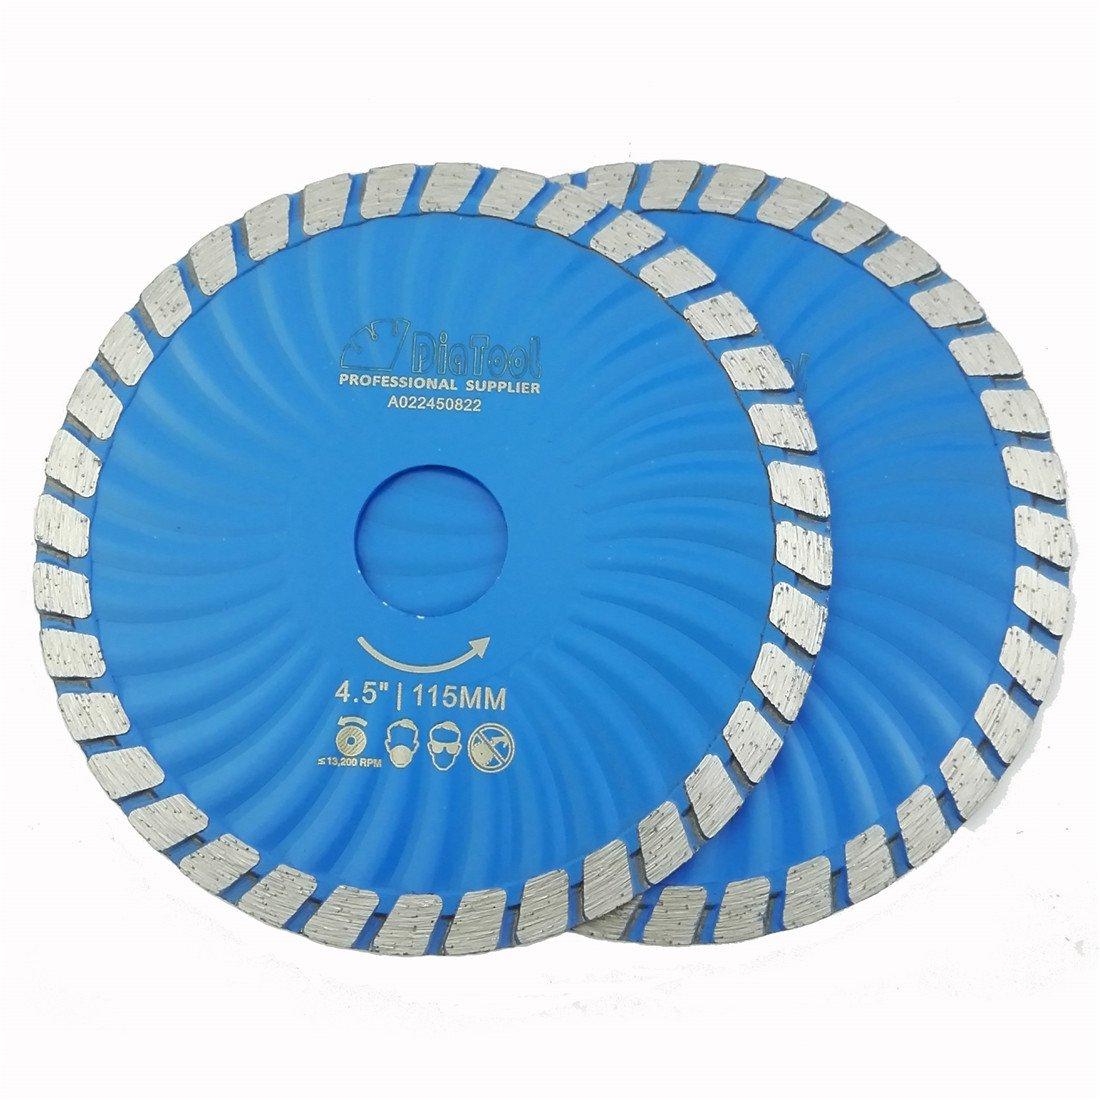 Disco de Diamante SHDIATOOL Diamante de hoja turbo ondulada Dia 4 Paquete de 1/2 pulgada de 2 Corte Hormigón Ladrillo Az